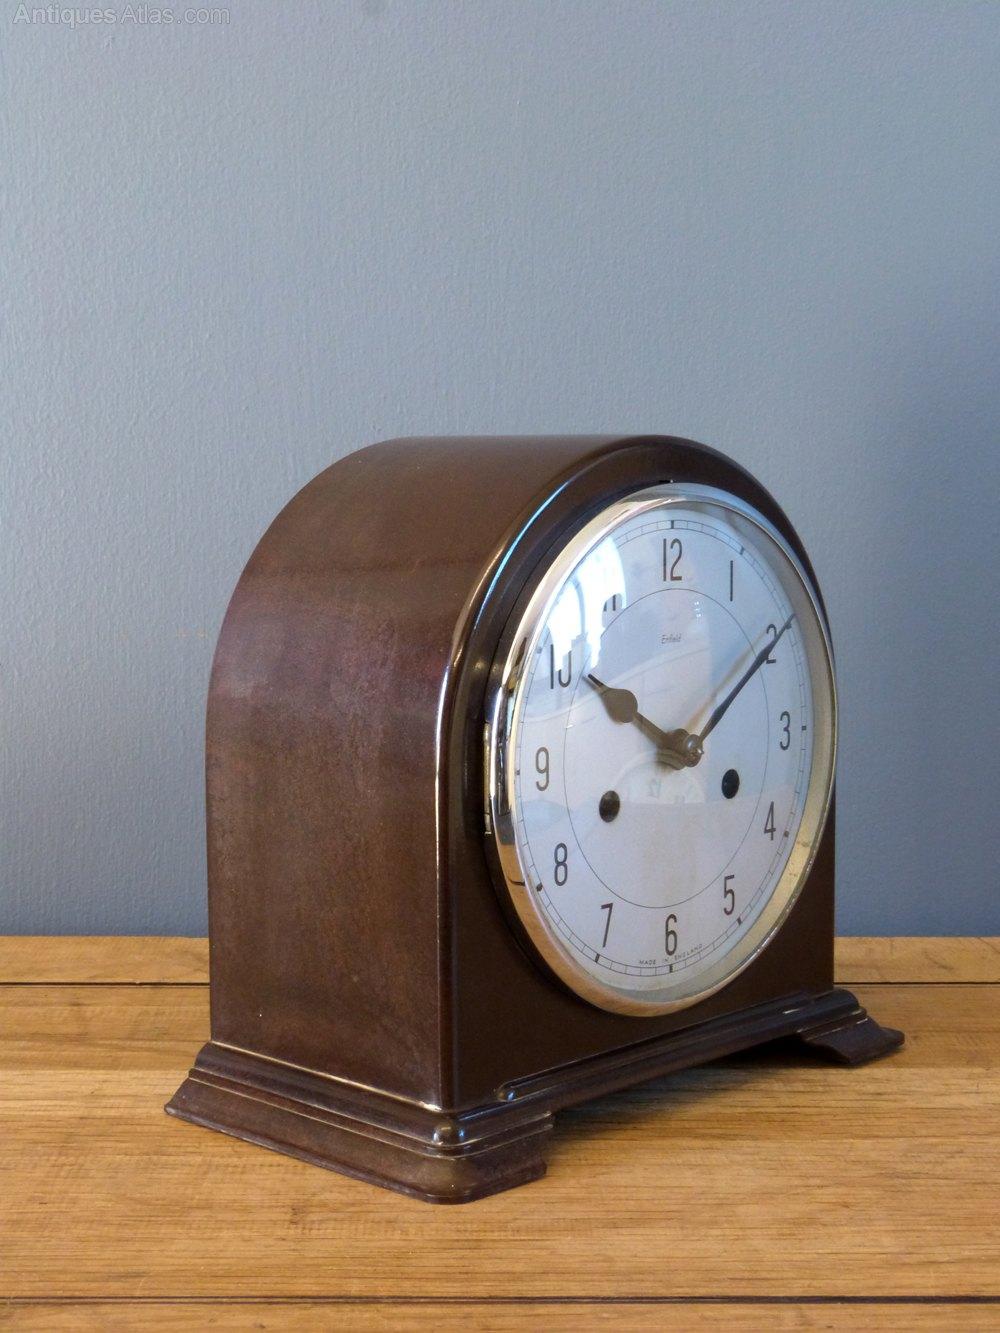 Antiques Atlas  1950s Bakelite Mantel Clock